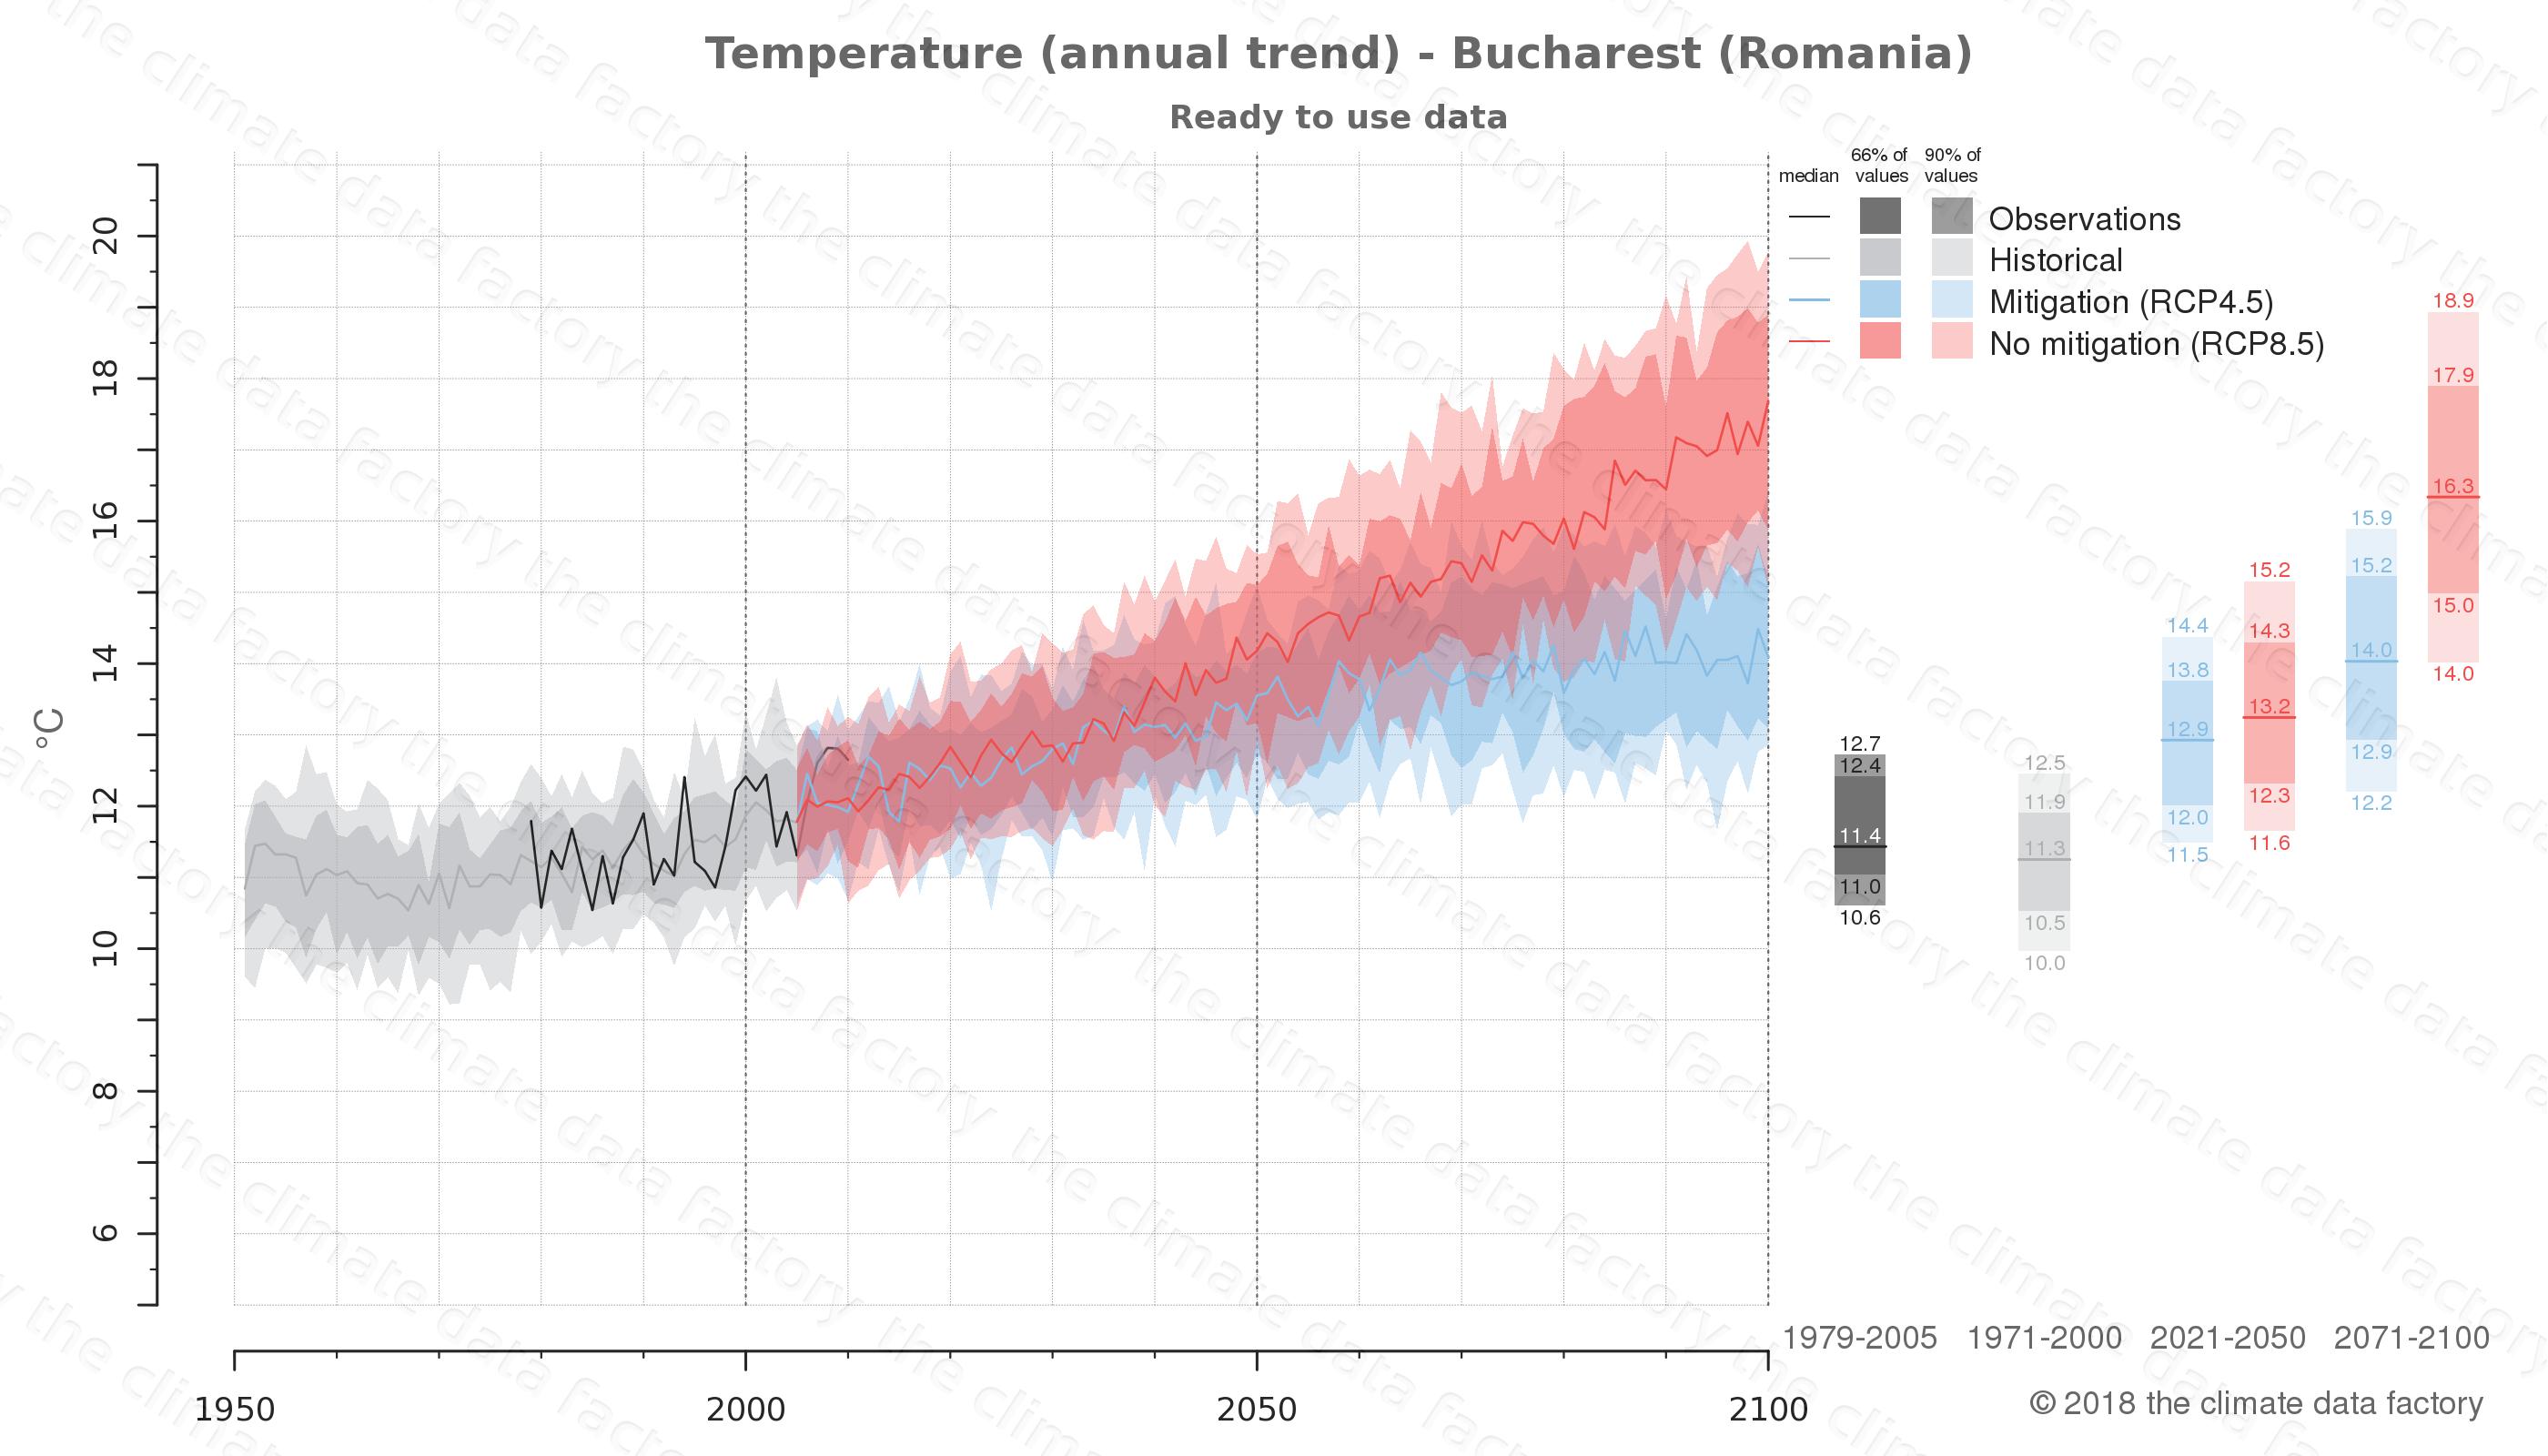 climate change data policy adaptation climate graph city data temperature bucharest romania